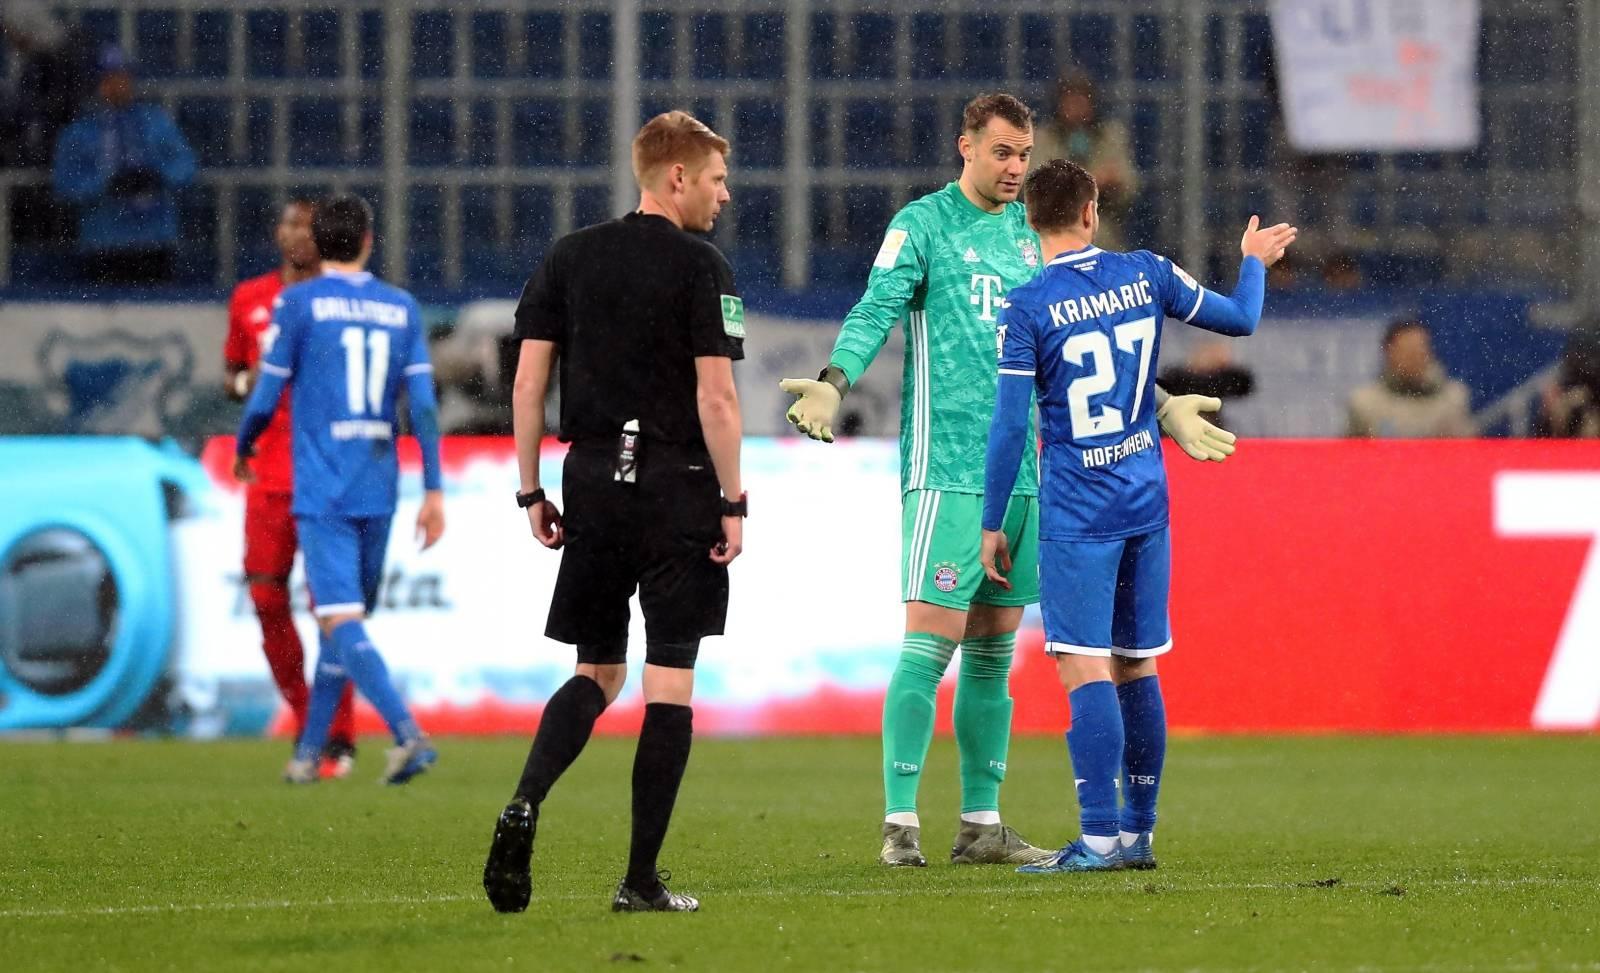 firo: 29.02.2020 Football, Soccer: 1. Bundesliga TSG Hoffenheim - FCB FC Bayern Munich Muenchen